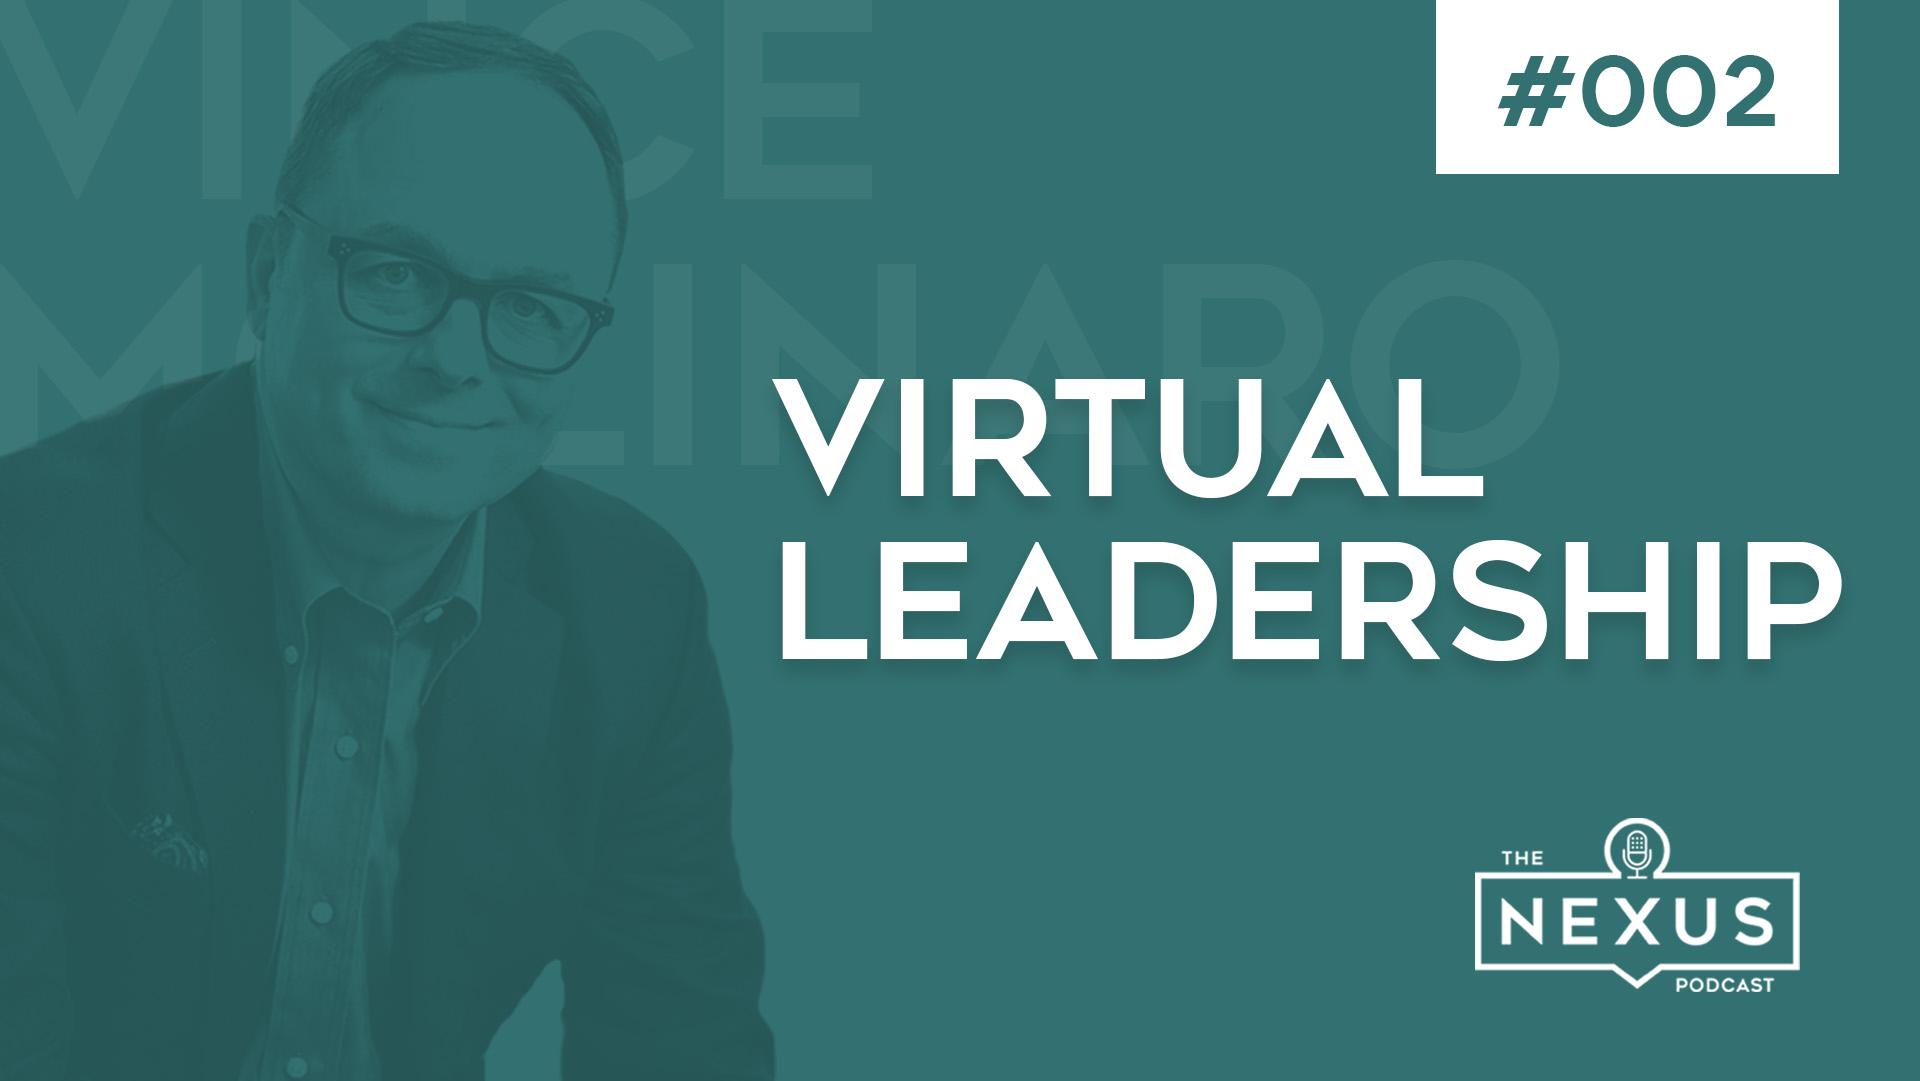 Virtual Leadership with Dr. Vince Molinaro